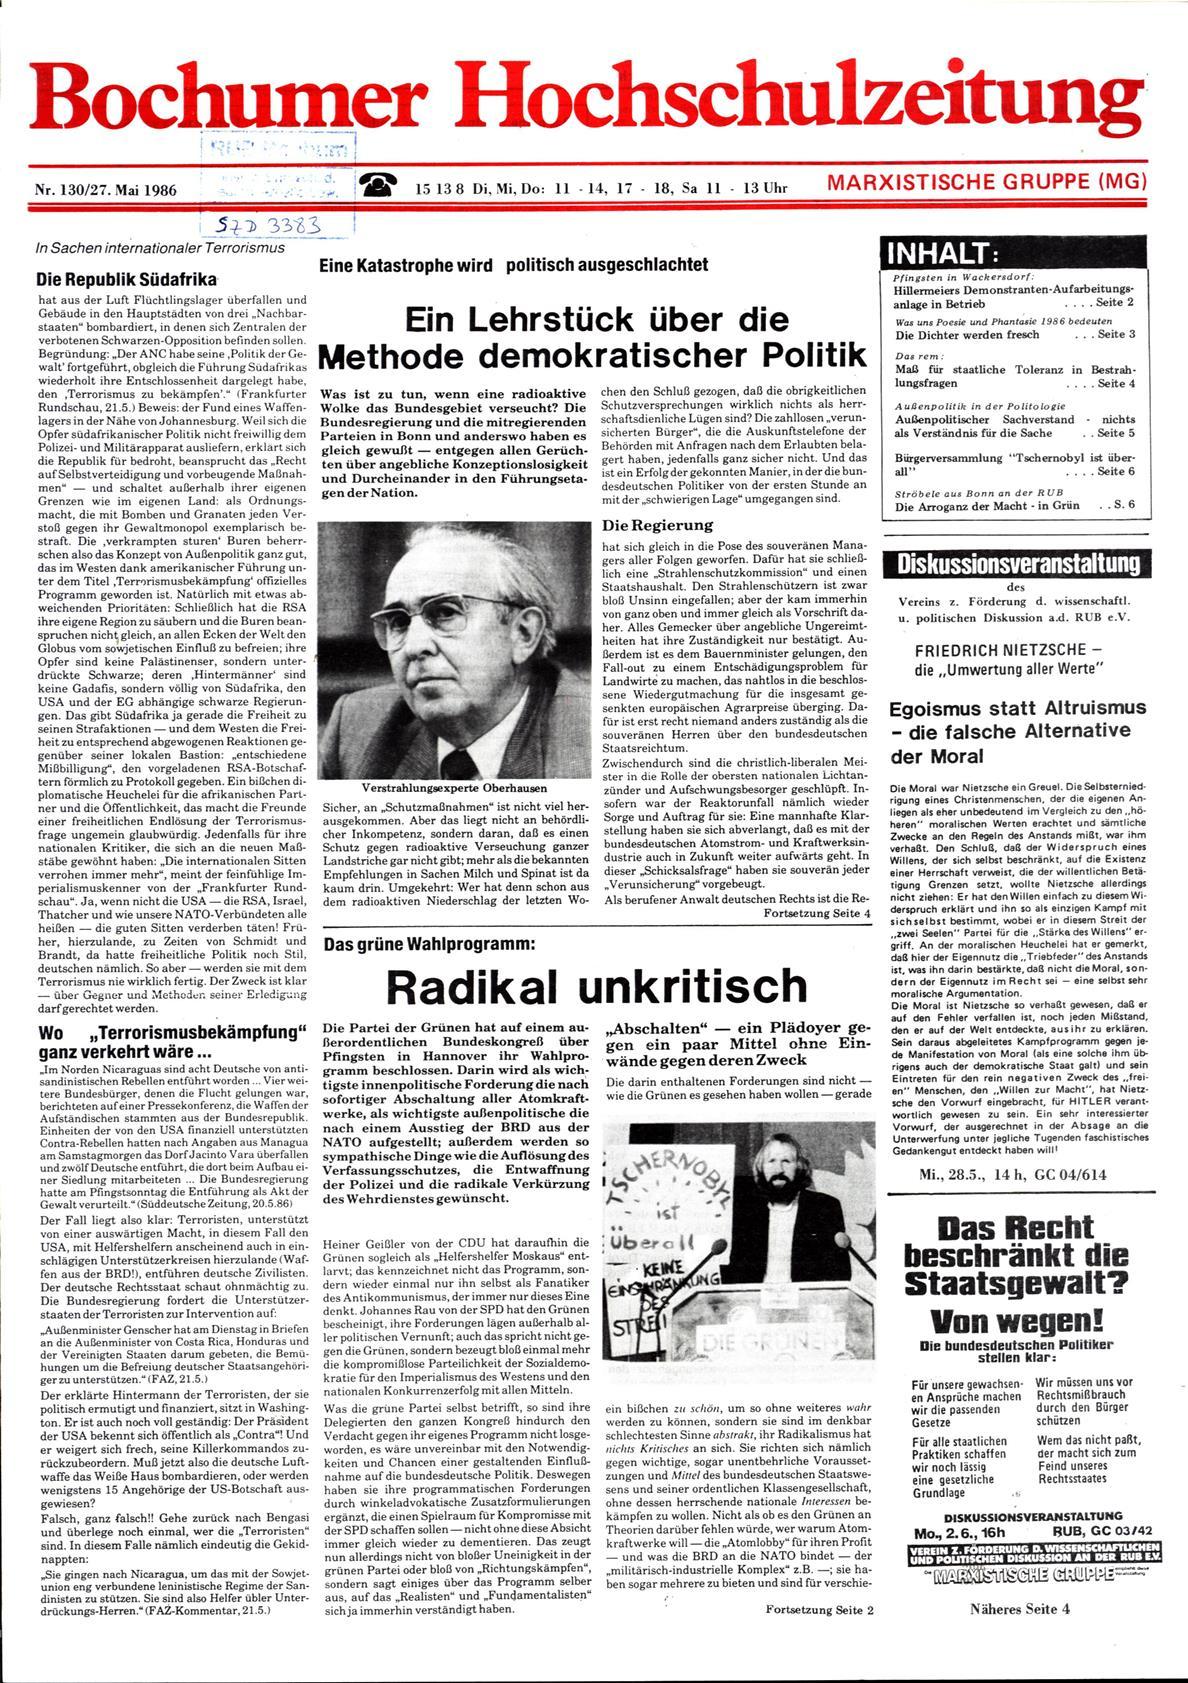 Bochum_BHZ_19860527_130_001